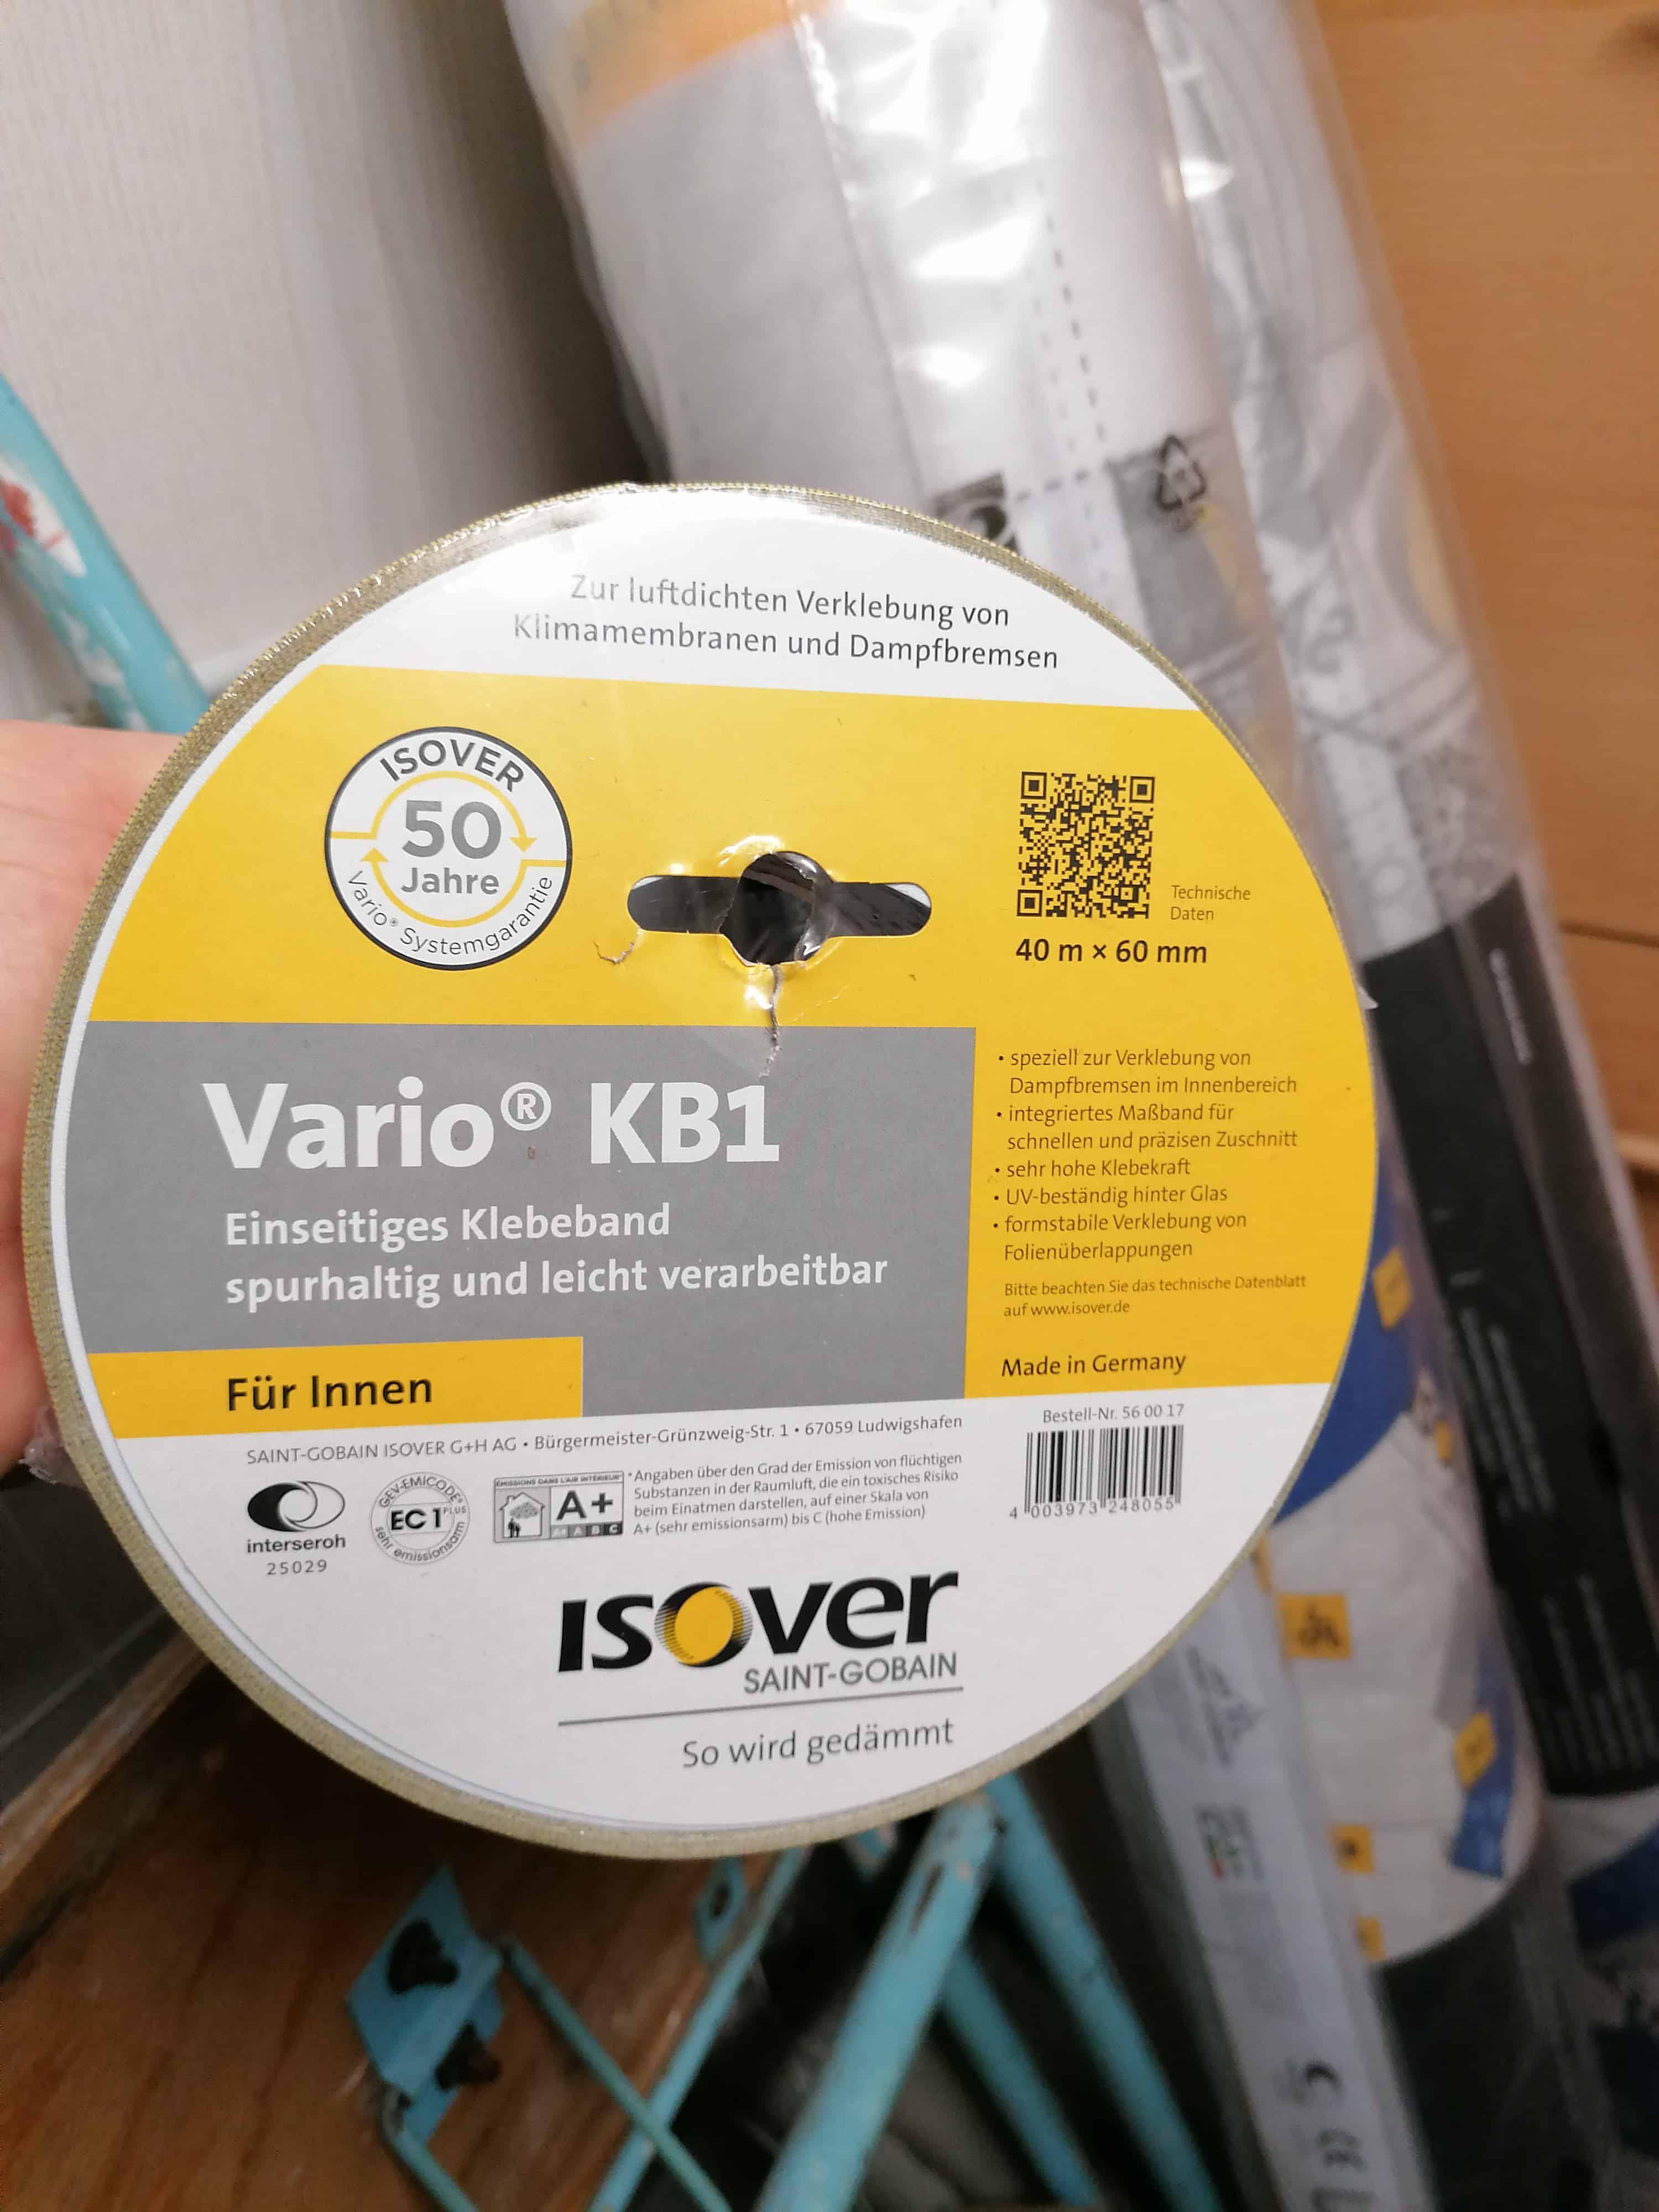 2x Isover Vario KM Duplex UV1.500mm x40.000 insgesamt 60qm